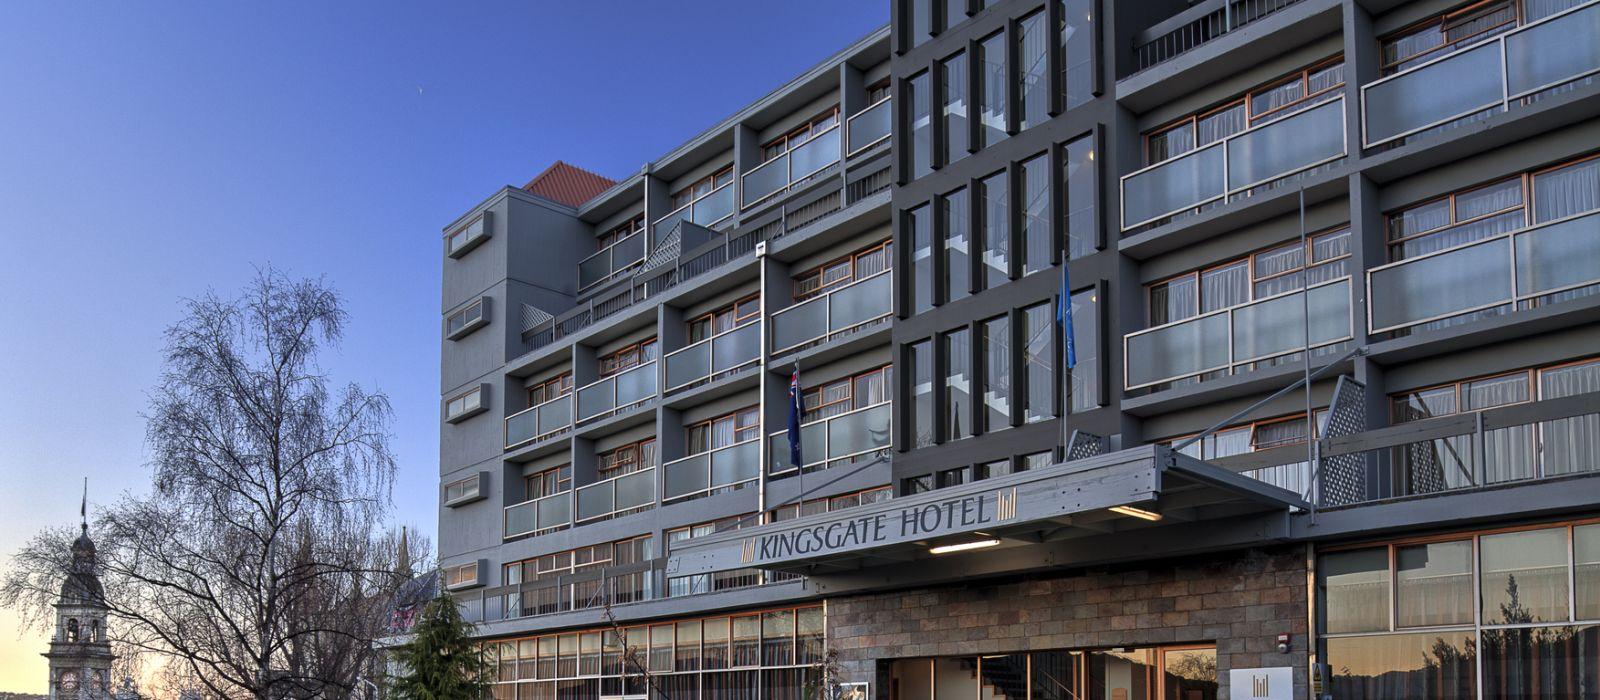 Hotel Kingsgate  Dunedin New Zealand